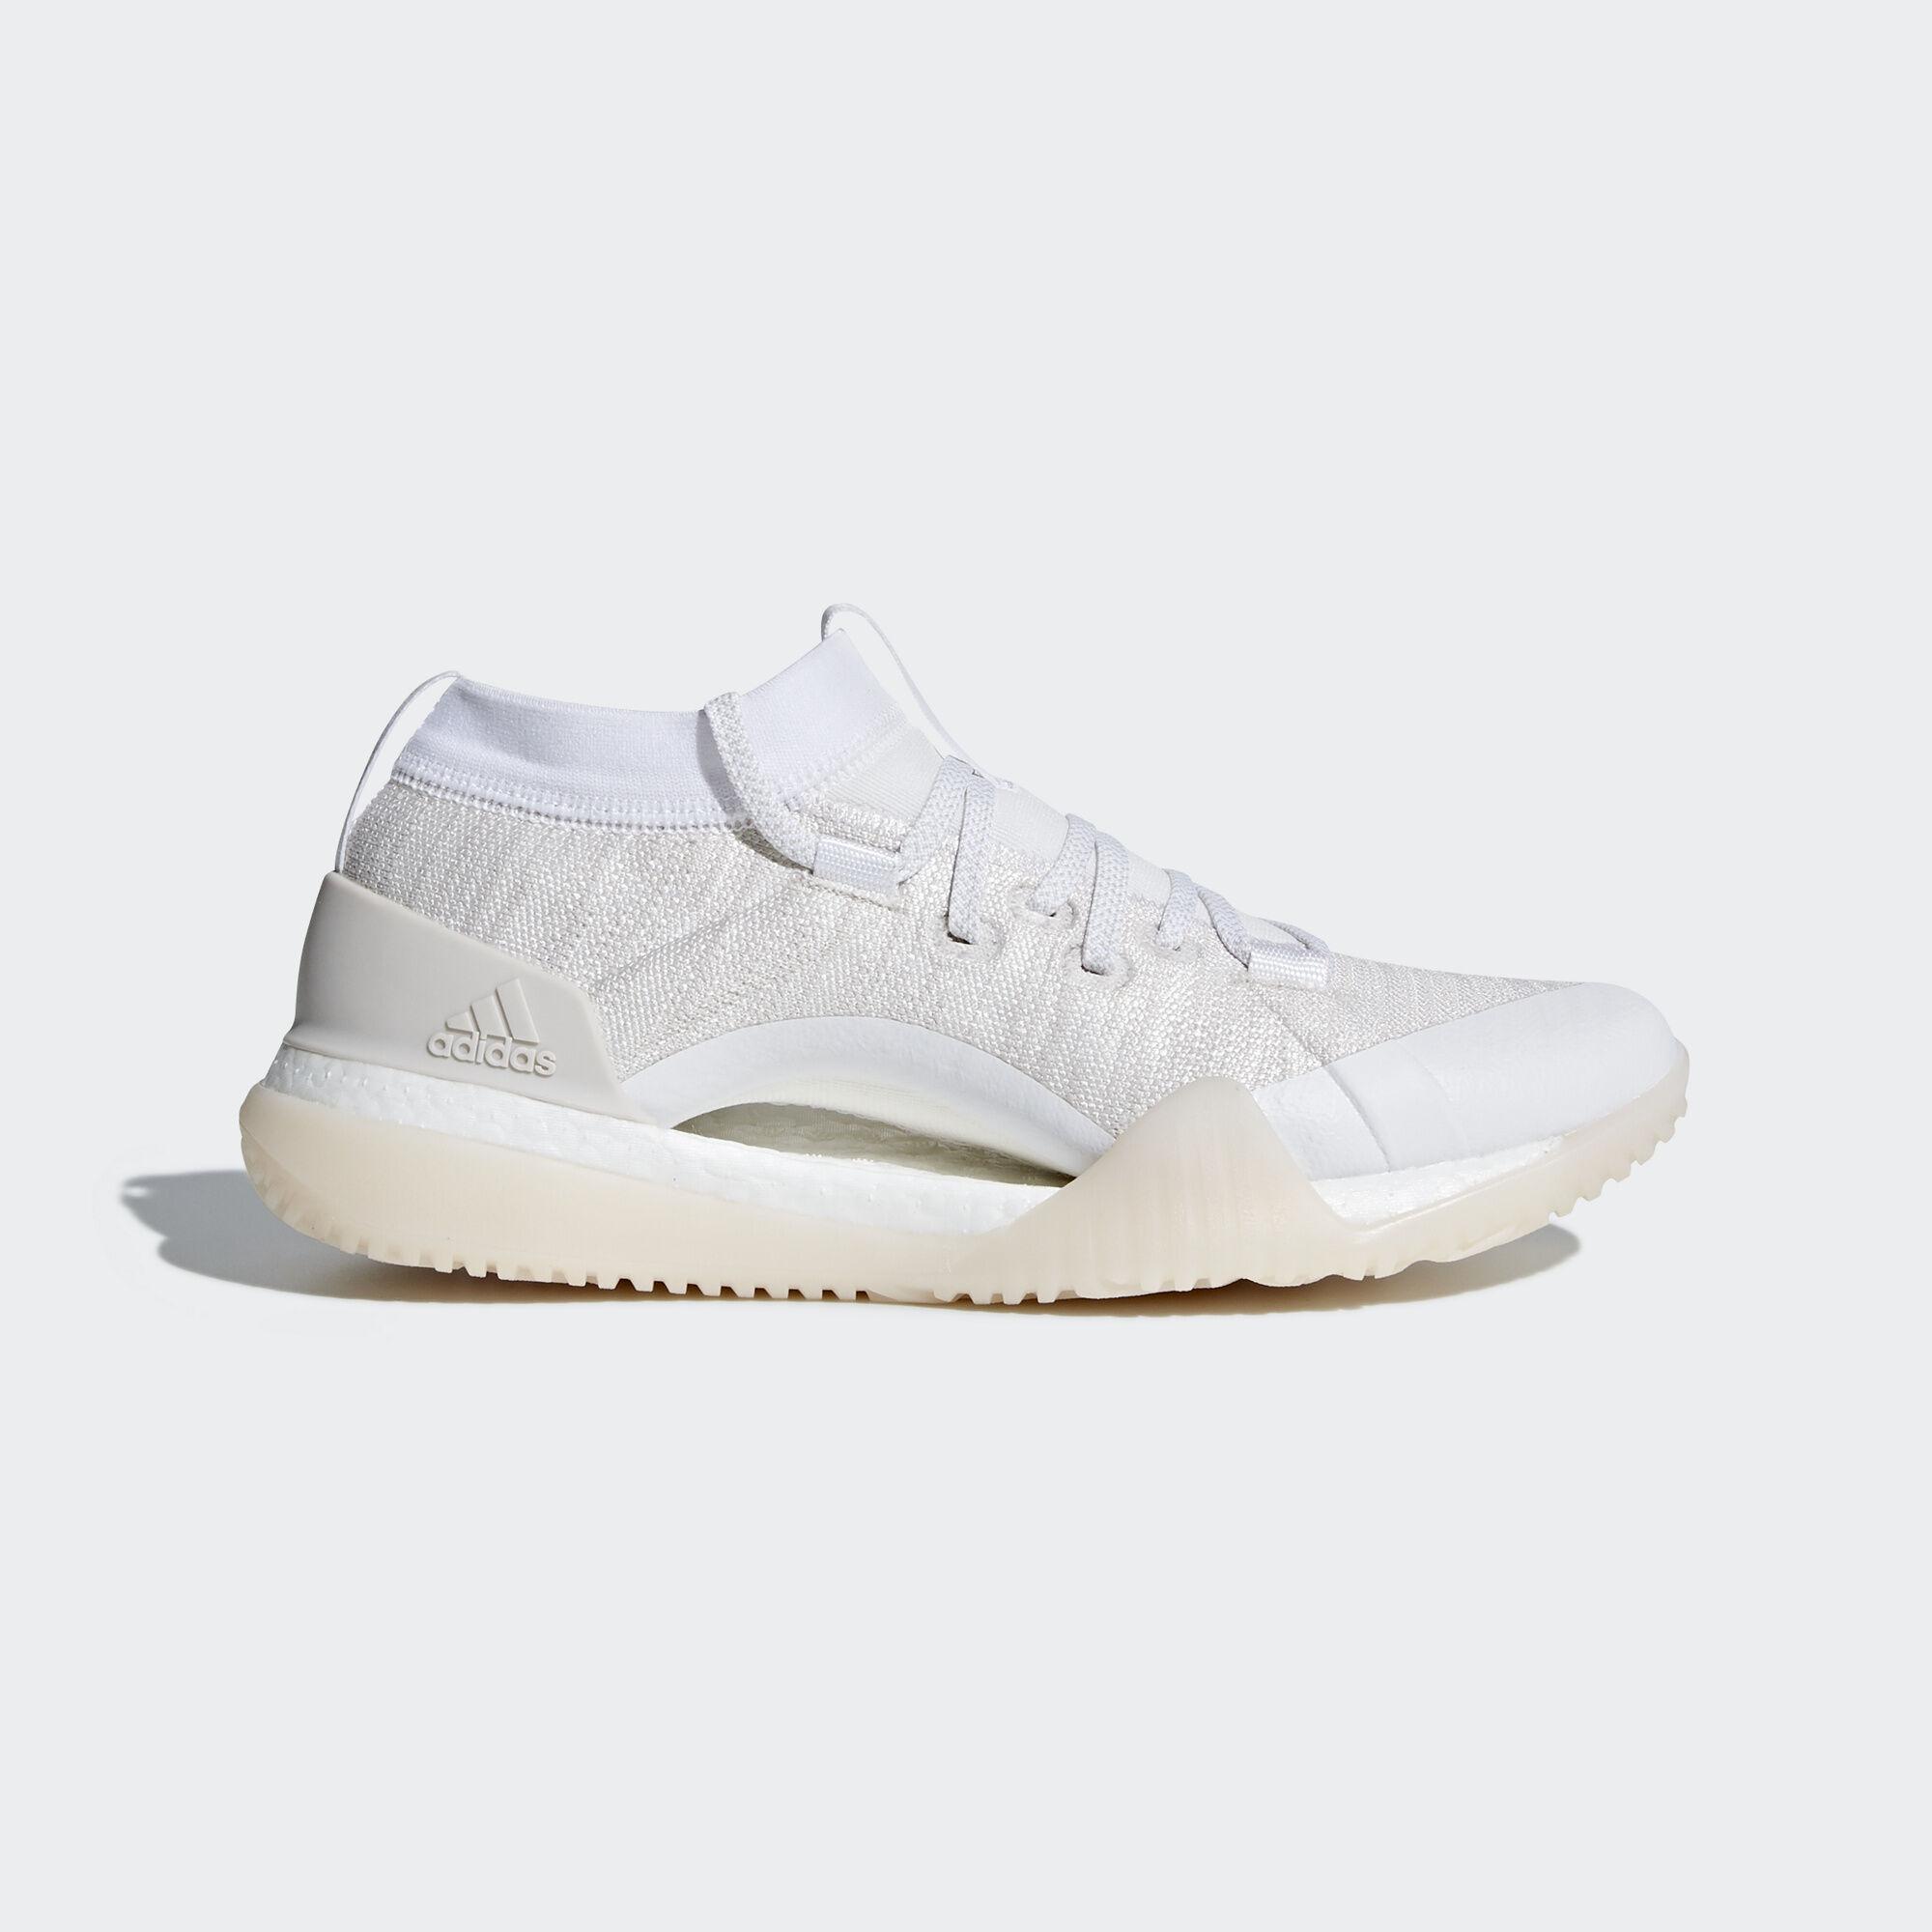 cb2f43e0842247 adidas - Pureboost X TR 3.0 Shoes Ftwr White Chalk Pearl Silver Metallic  CG3529